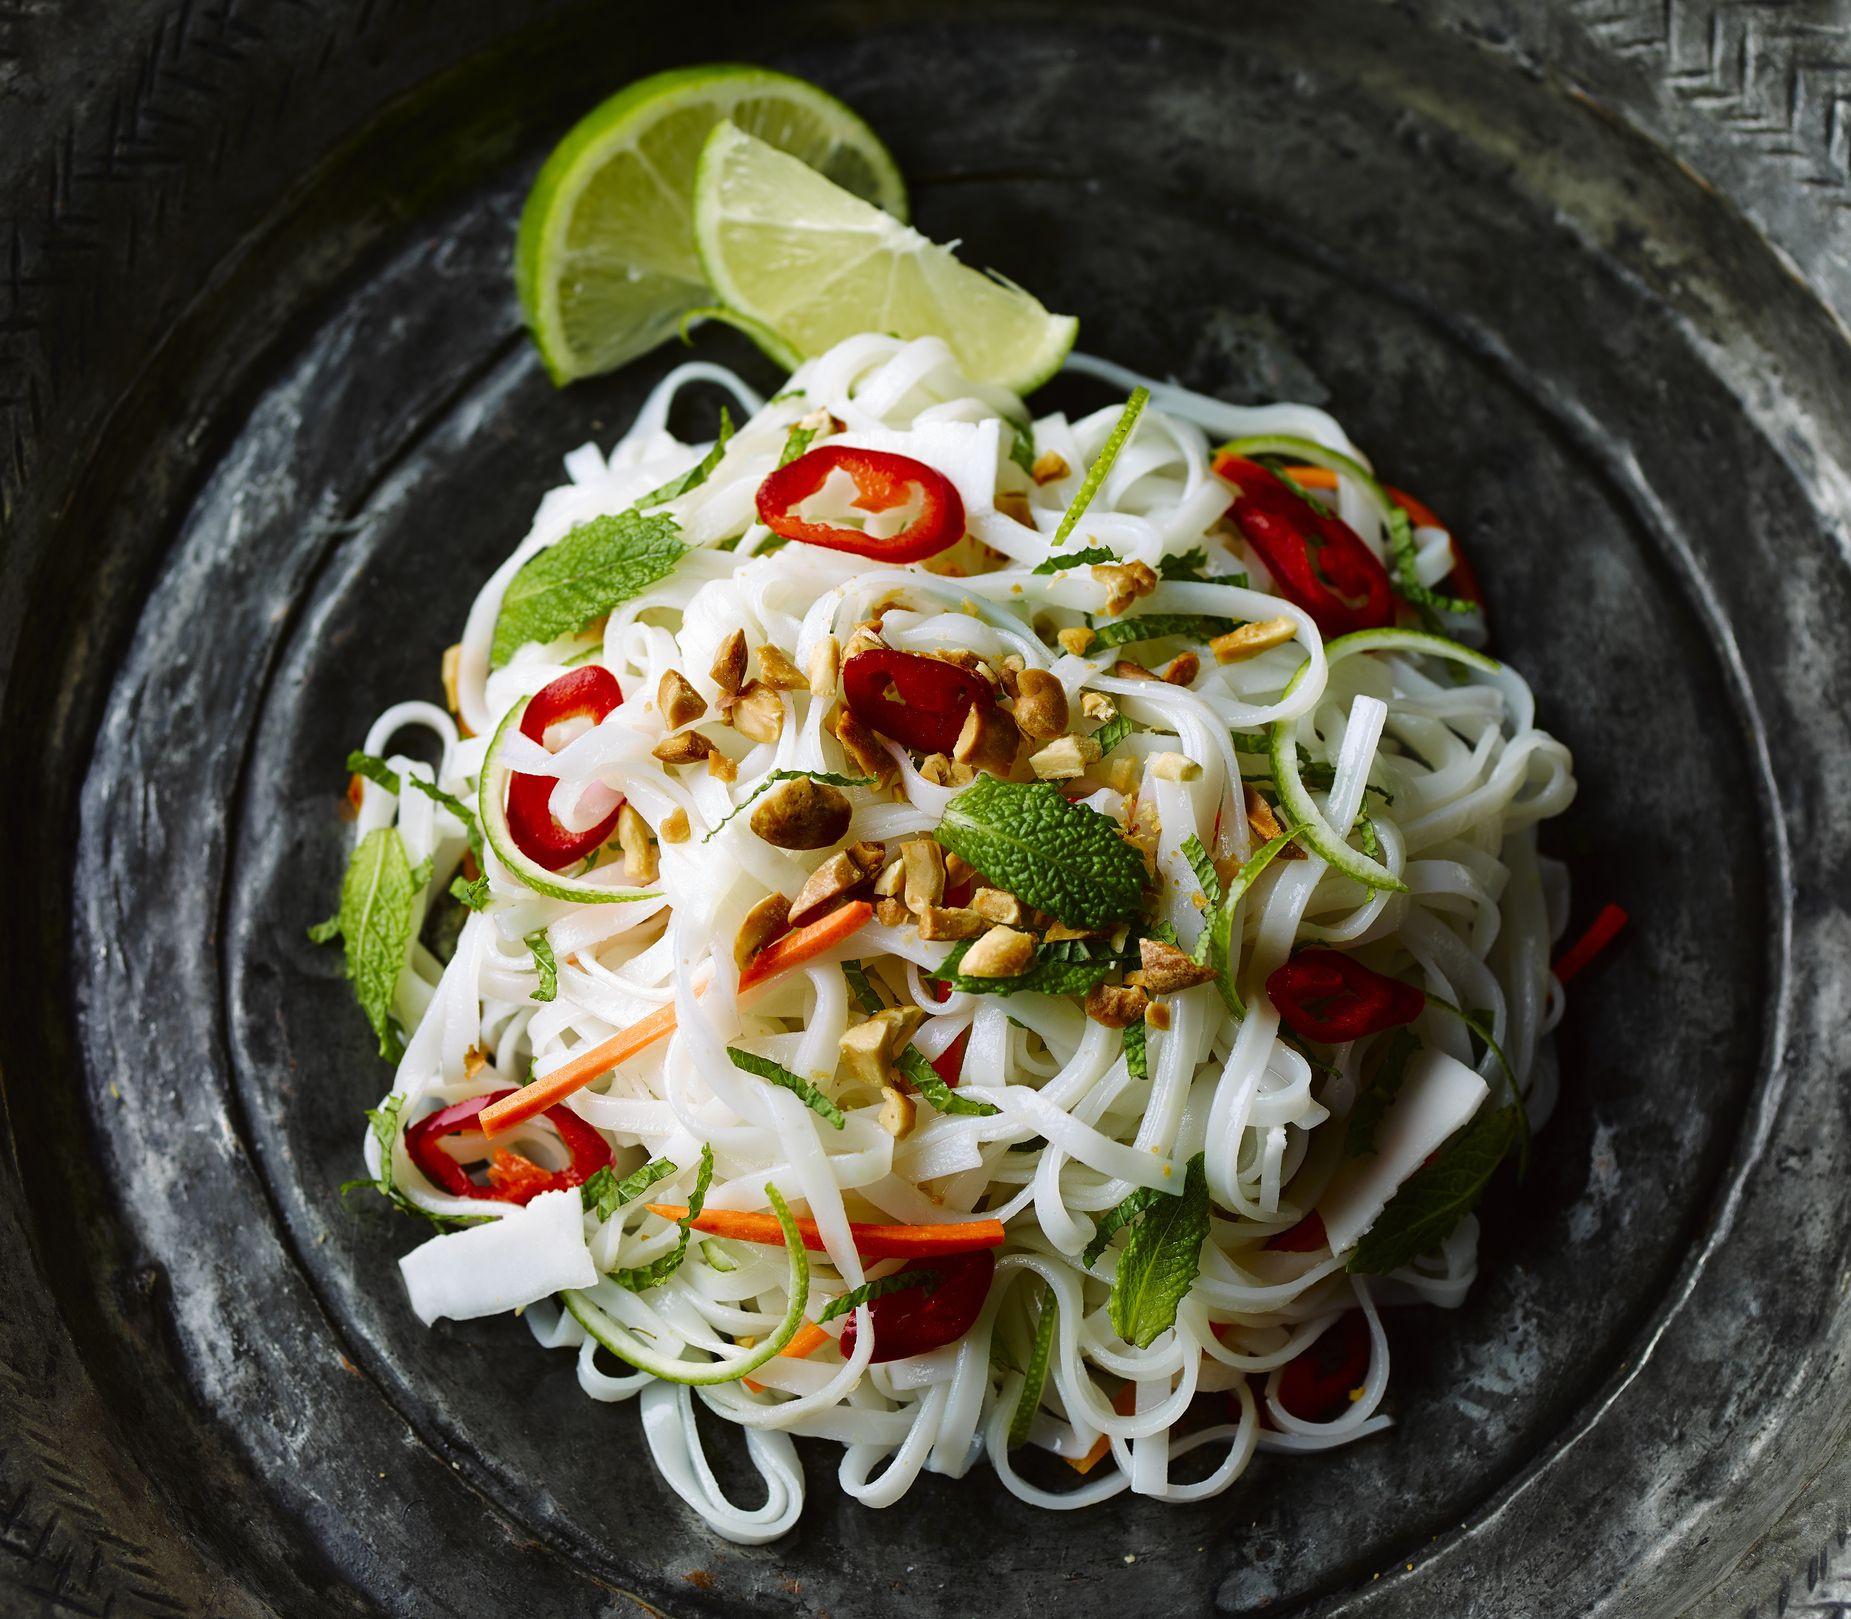 Vegetarian Rice Noodles Recipe  Easy Thai Ve arian Rice Noodles with Basil Recipe